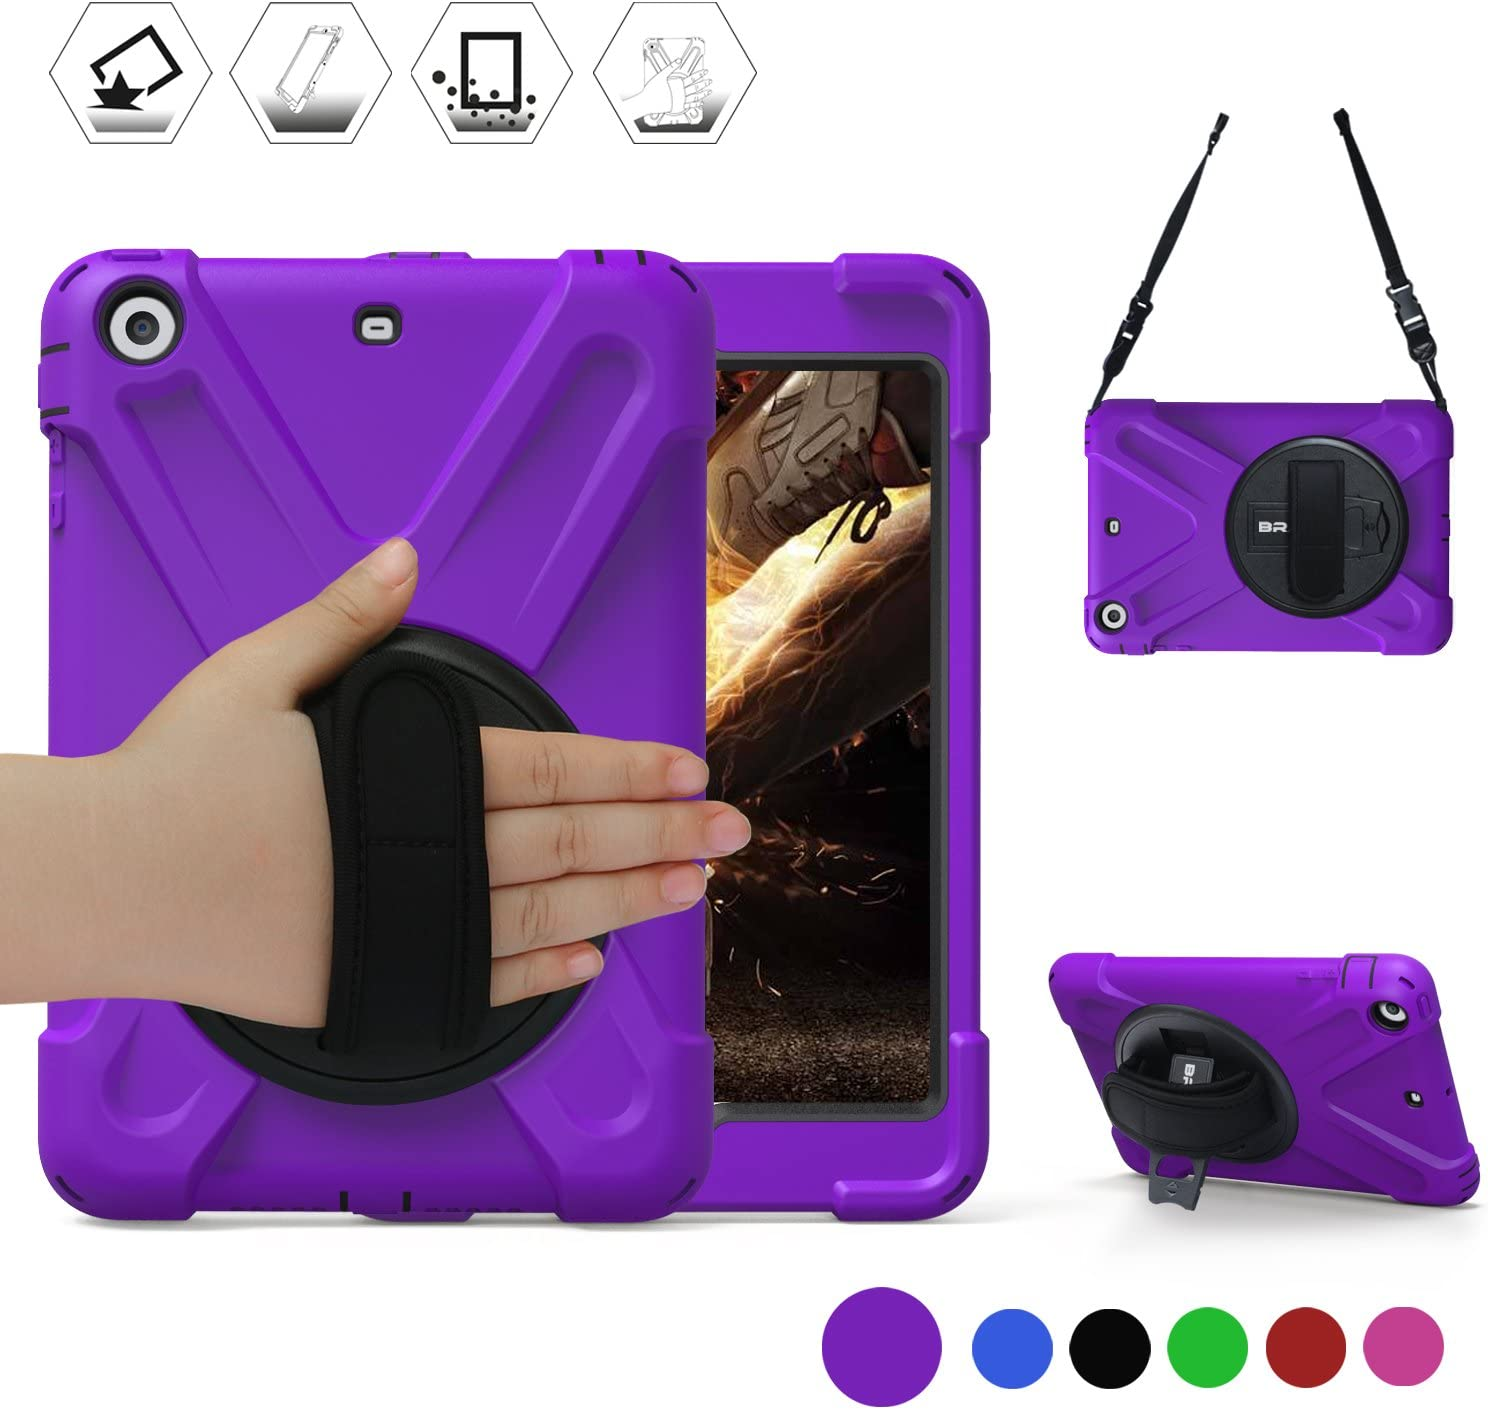 iPad Mini Case,iPad Mini 2 360 Degree[Heavy Duty] Swivel Stand/Hand Strap and a Shoulder Strap Case,iPad Mini 3[Shock Proof][Three Layer] Rugged Hybrid Protective with Kickstand Case (Purple)